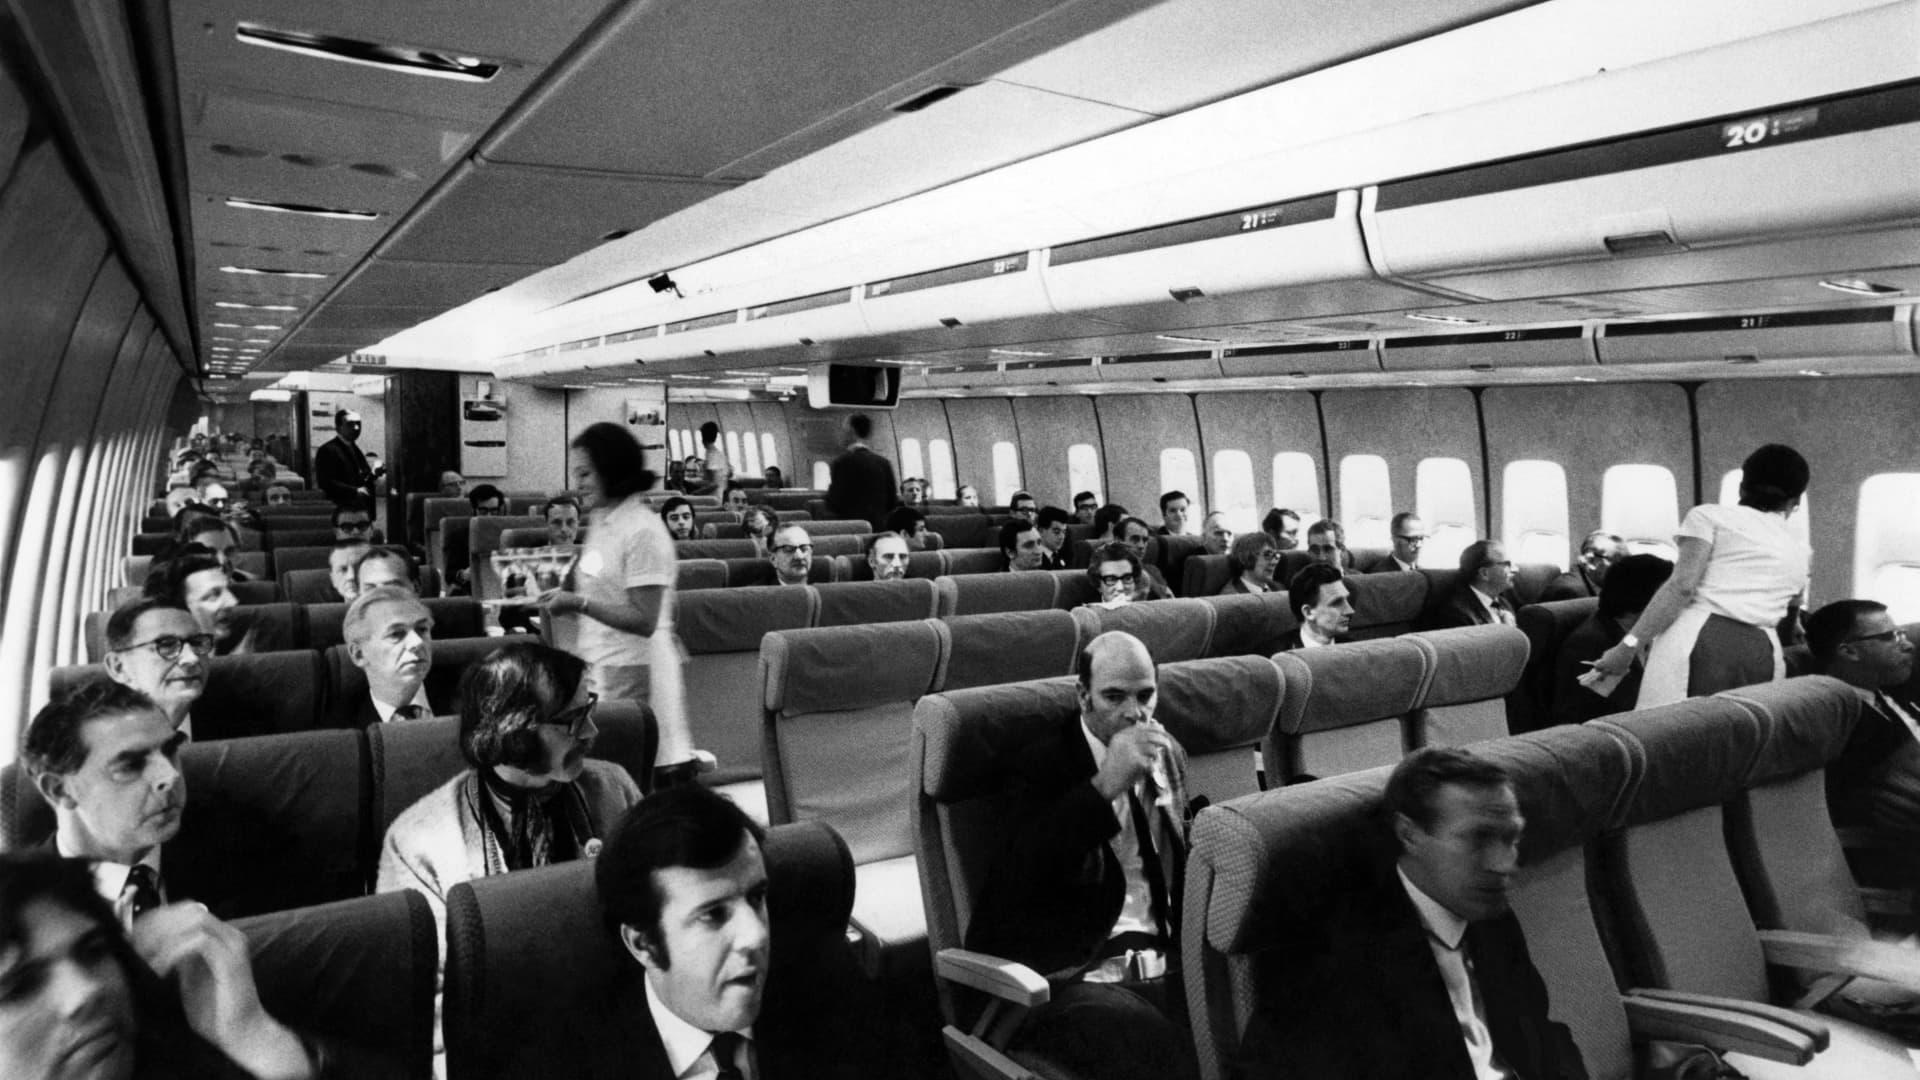 The interior of a Boeing 747 jumbo jet, circa 1970.